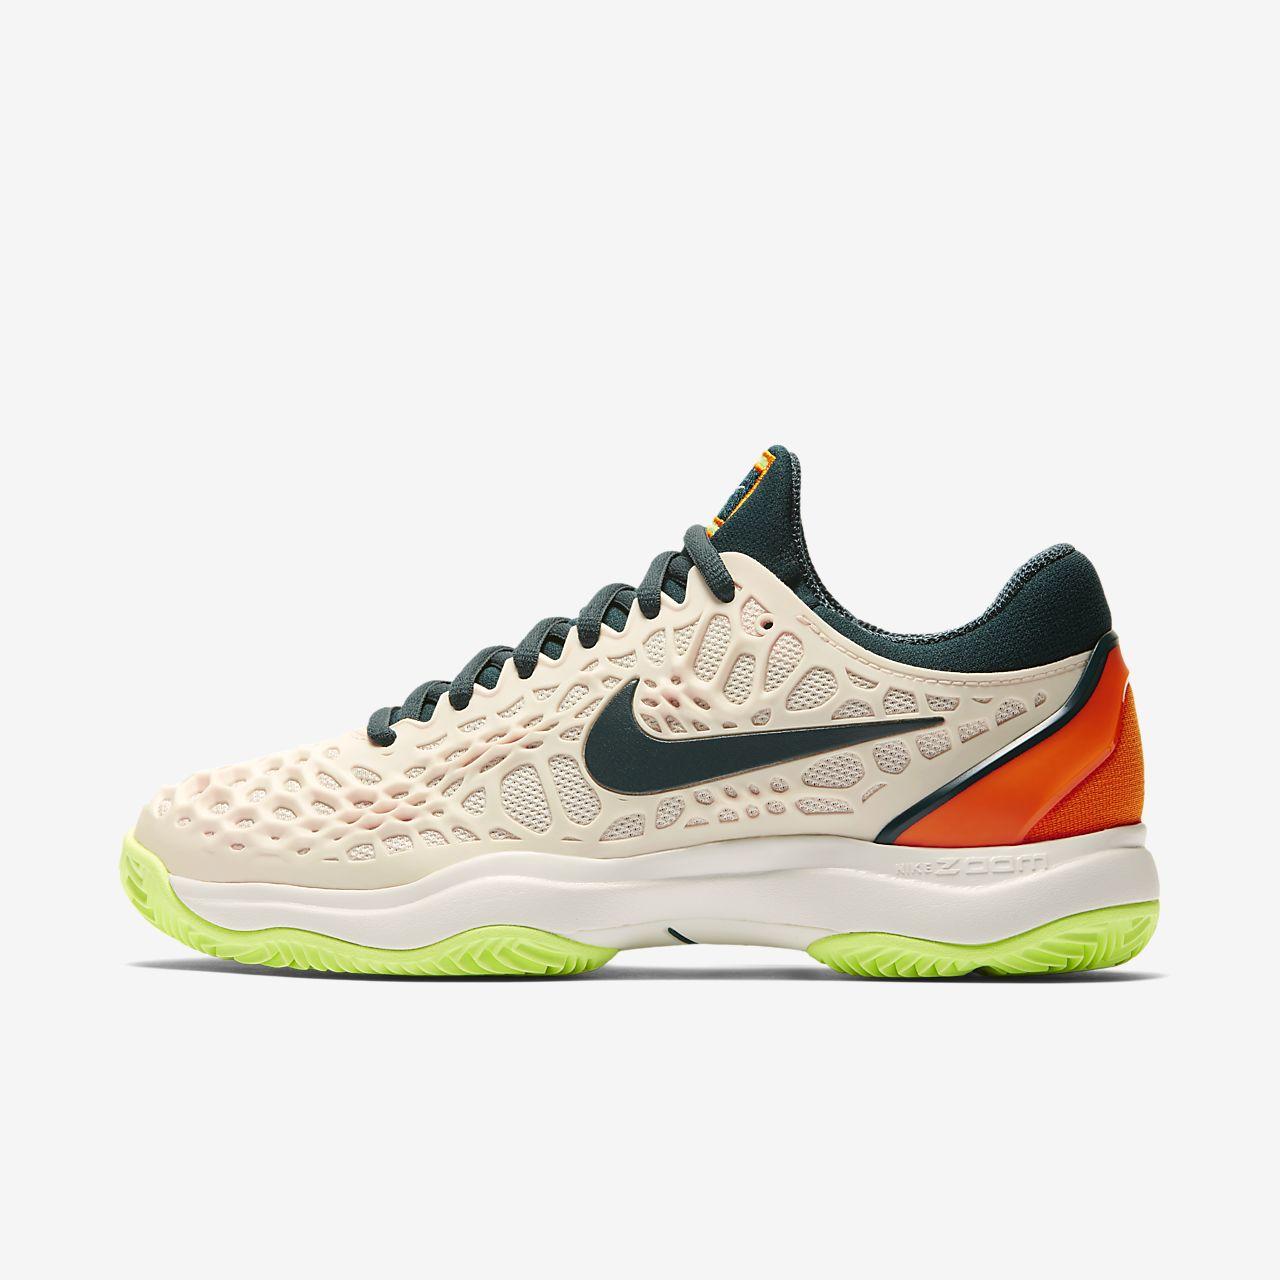 bbb847927e0b Nike Zoom Cage 3 Clay Women s Tennis Shoe. Nike.com AU